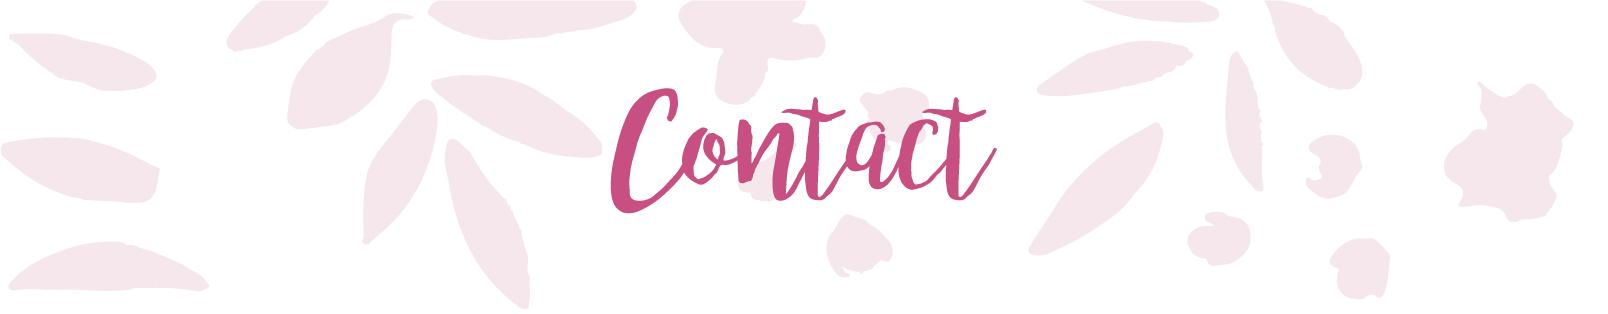 Contact July 19.jpg